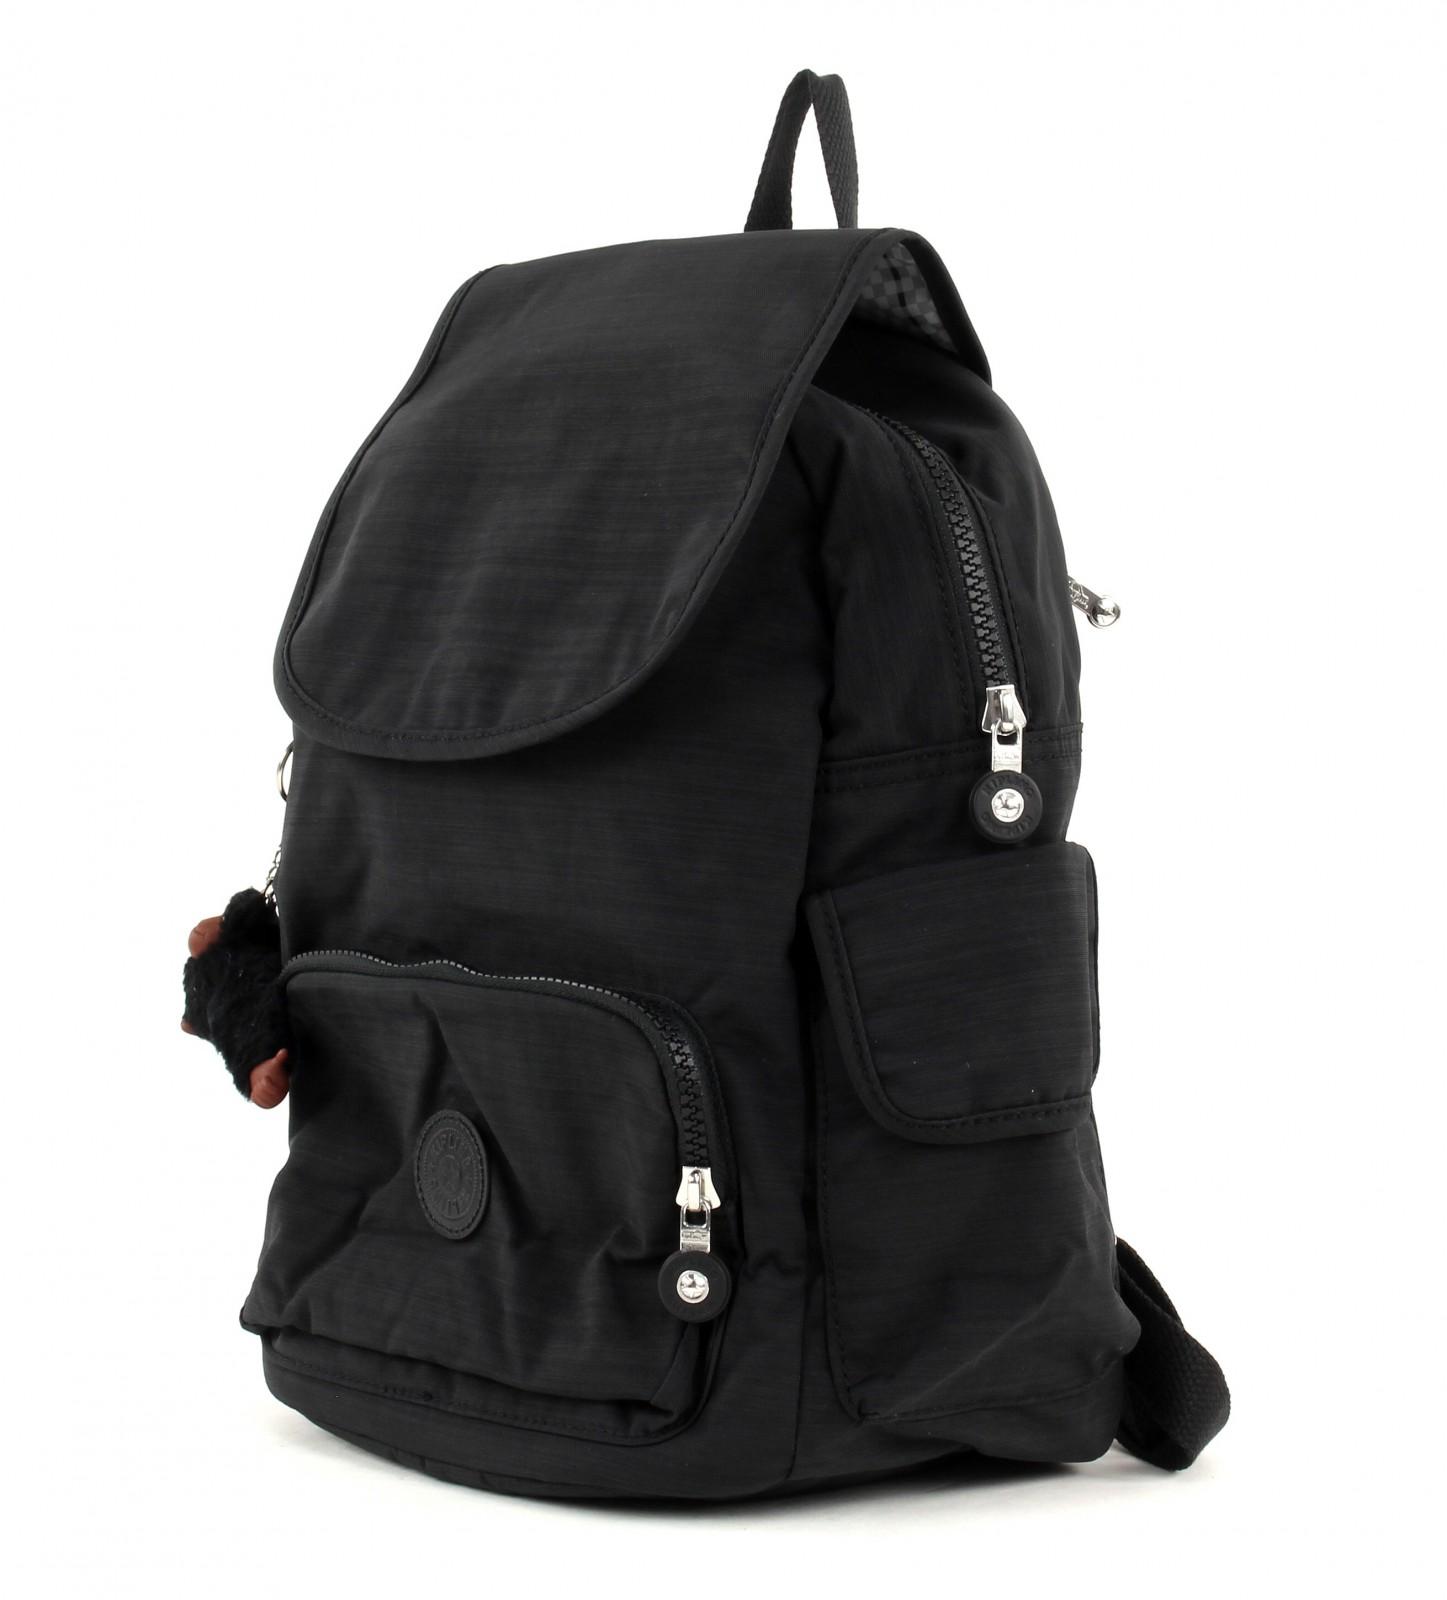 73ee8872a10c3 ... Eyes Wide Open City Pack S Backpack Dazz Black   69